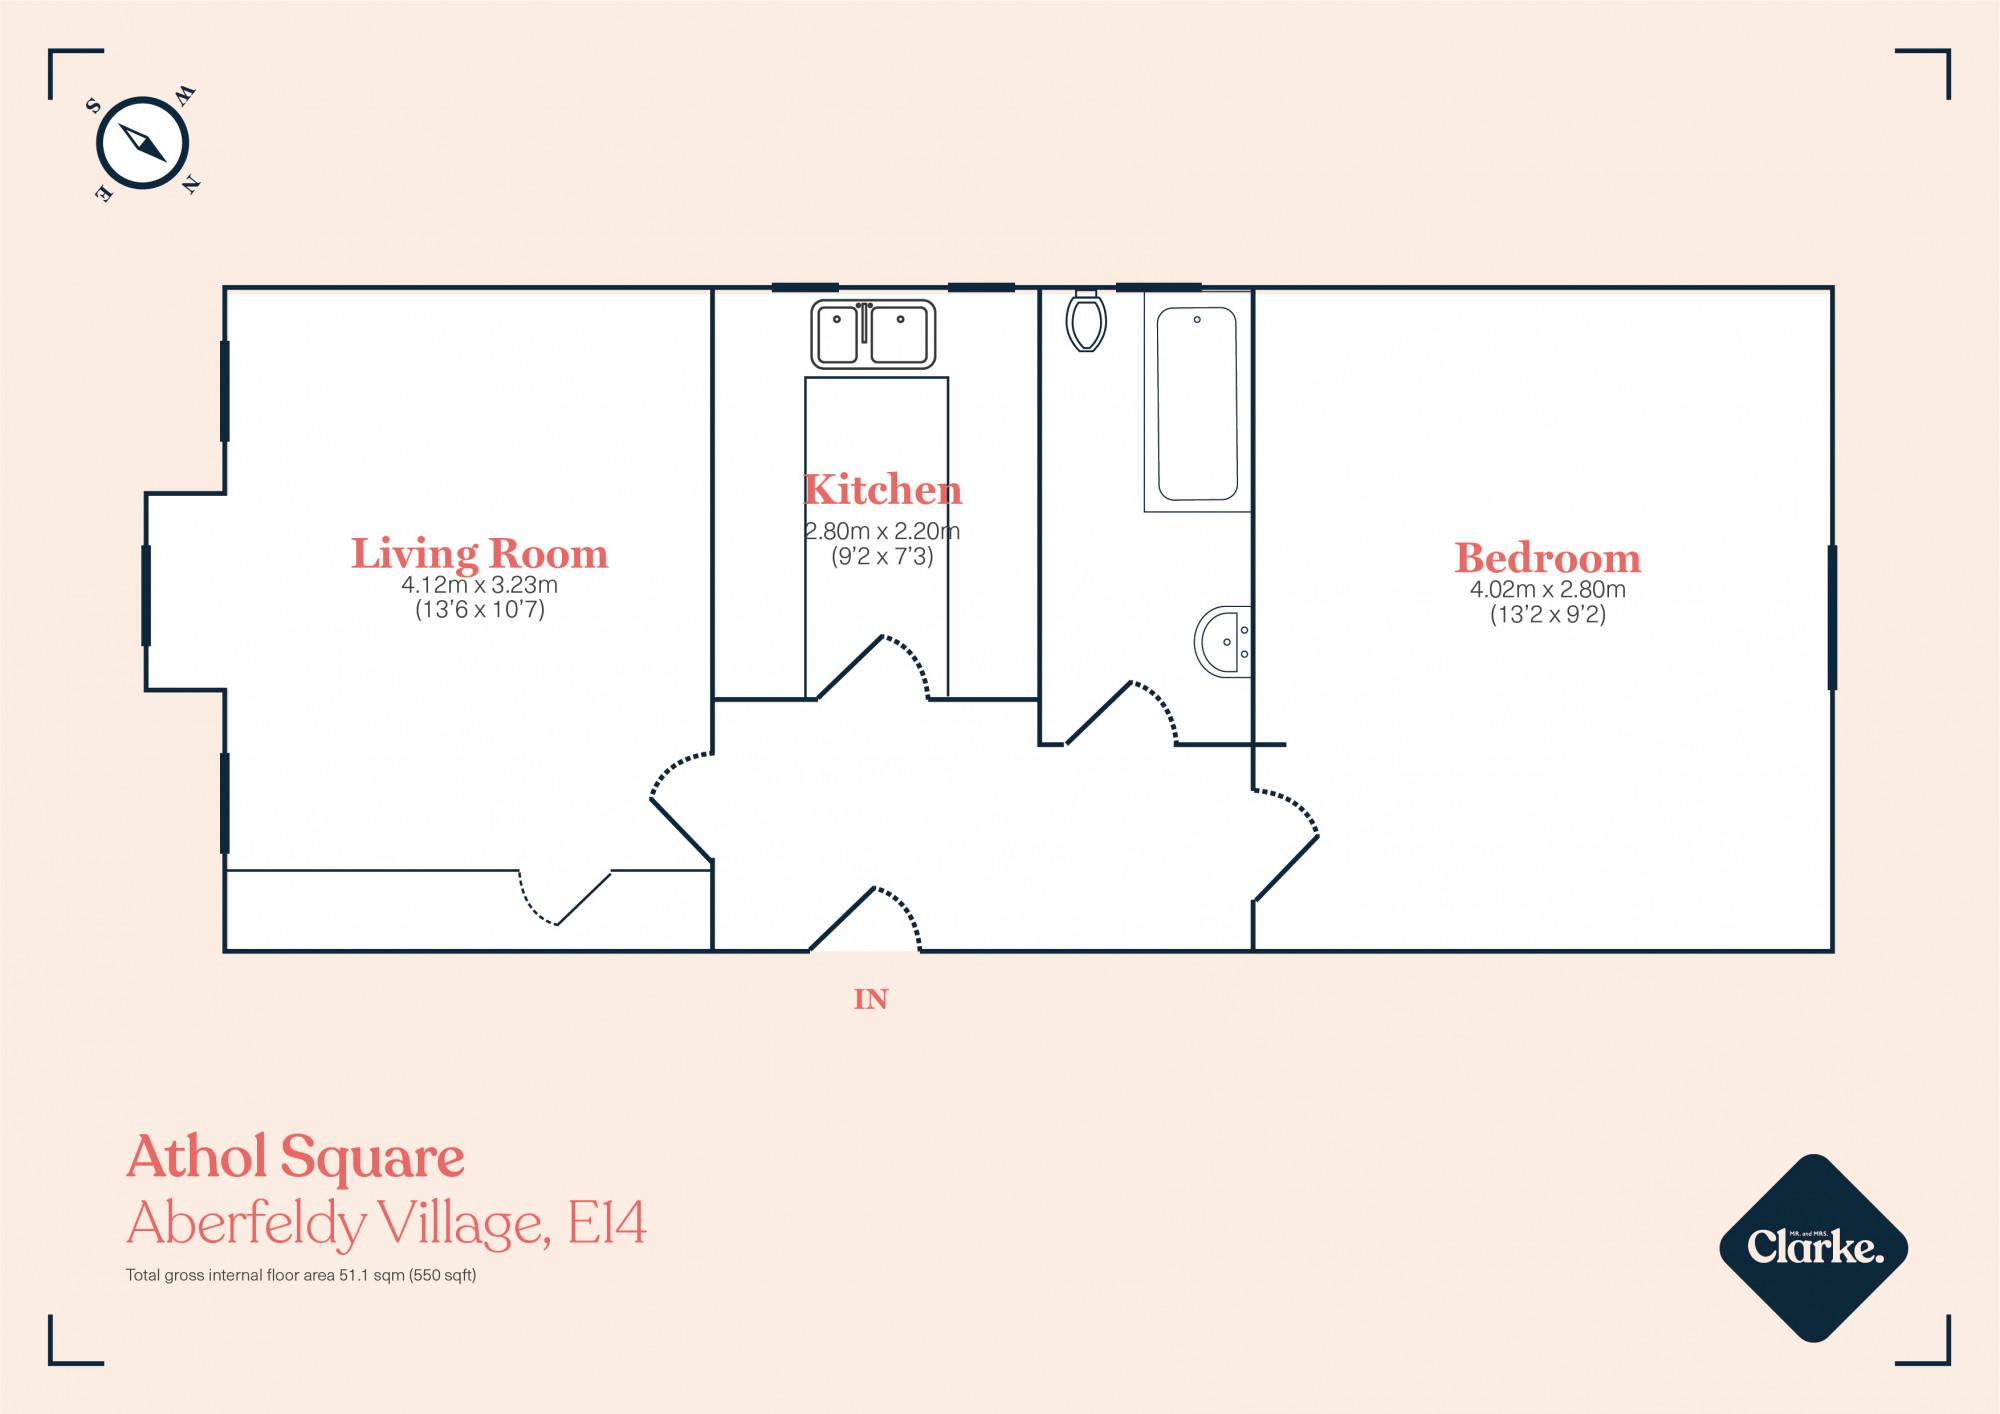 Athol Square, Aberfeldy Village. Floorplan.